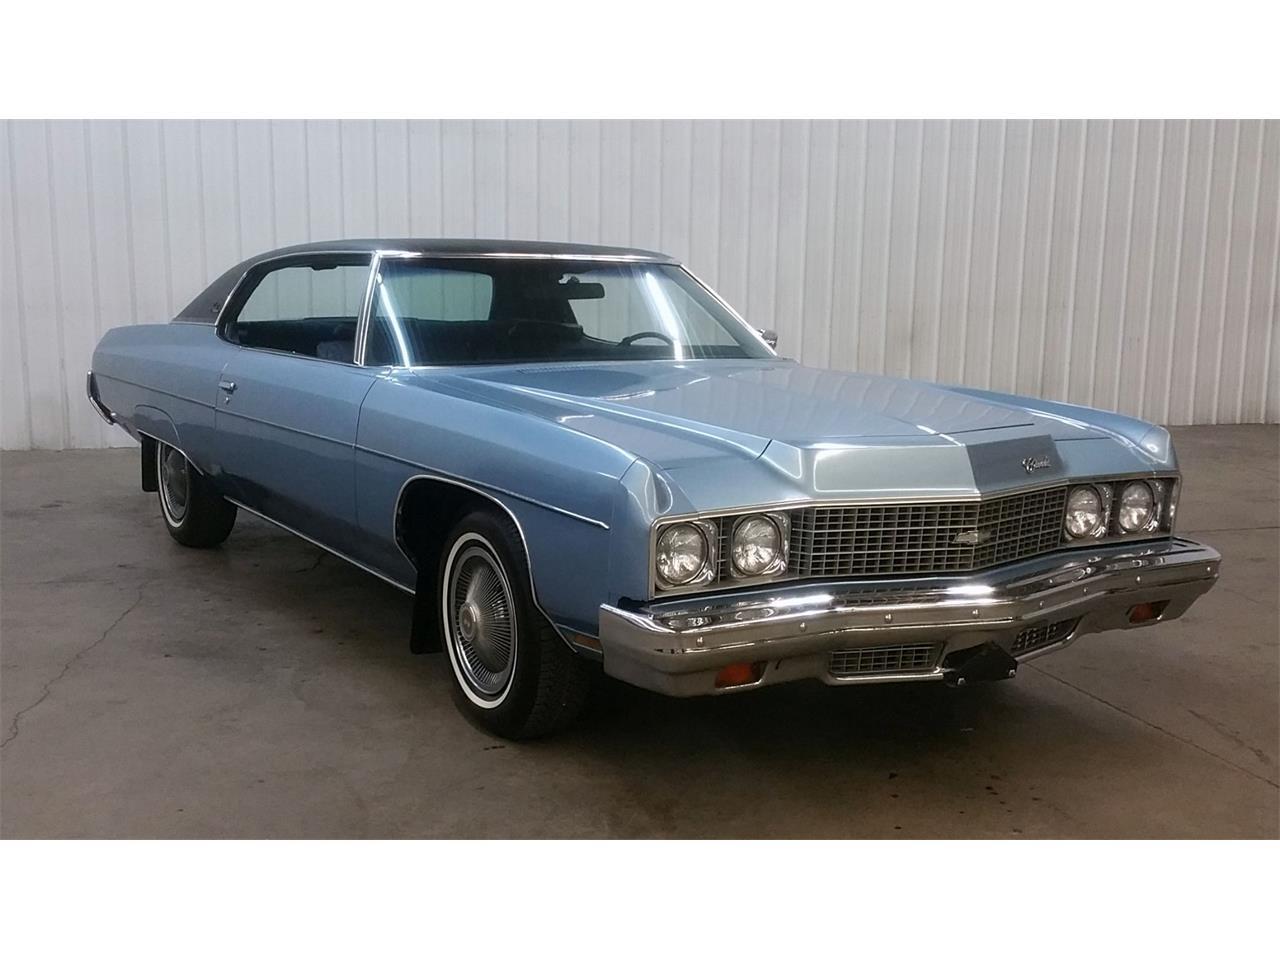 For Sale 1973 Chevrolet Impala In Maple Lake Minnesota